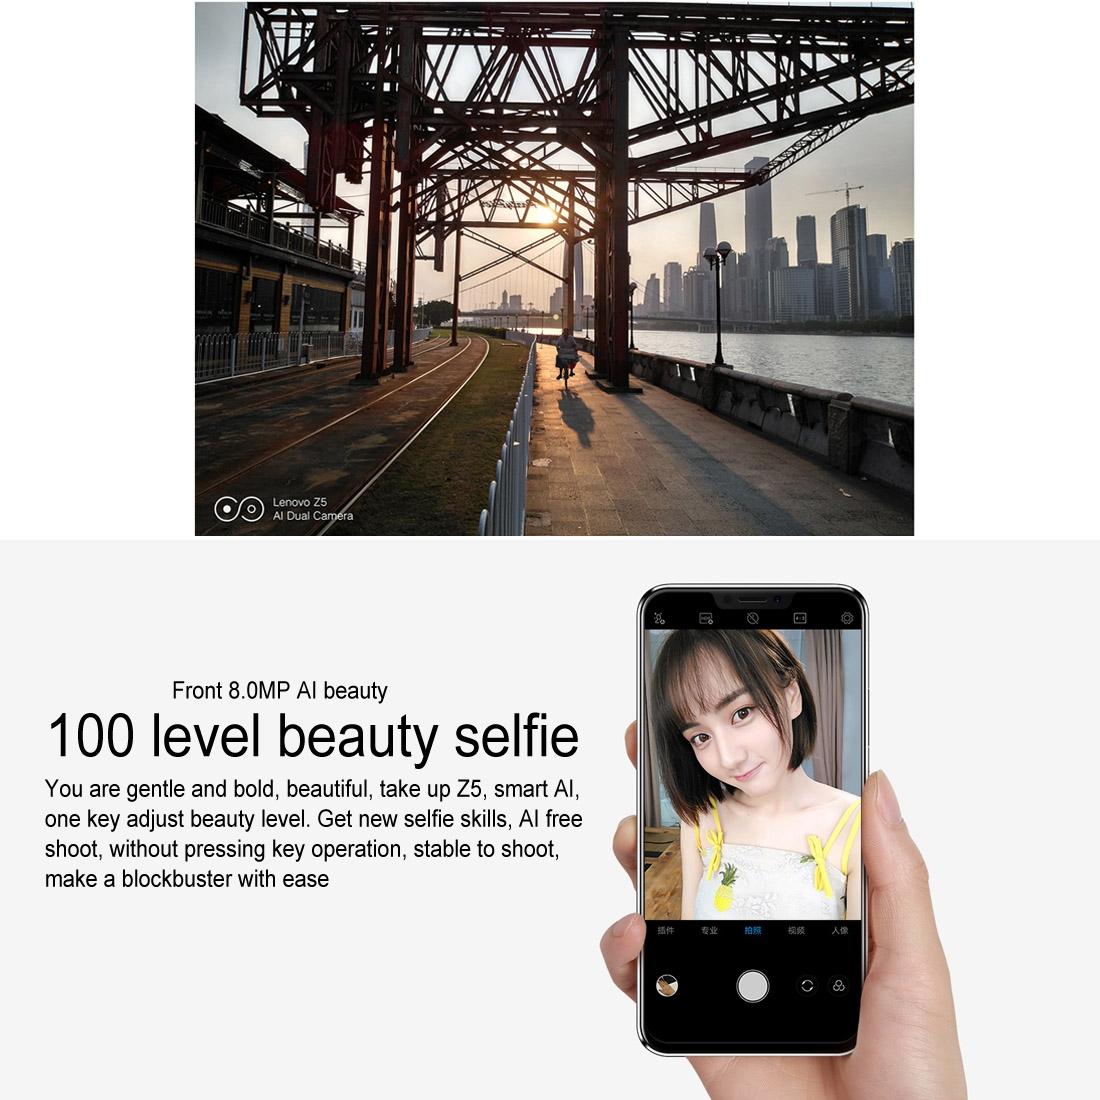 i.ibb.co/WKnq1HR/Smartphone-6-GB-64-GB-Lenovo-Z5-11.jpg